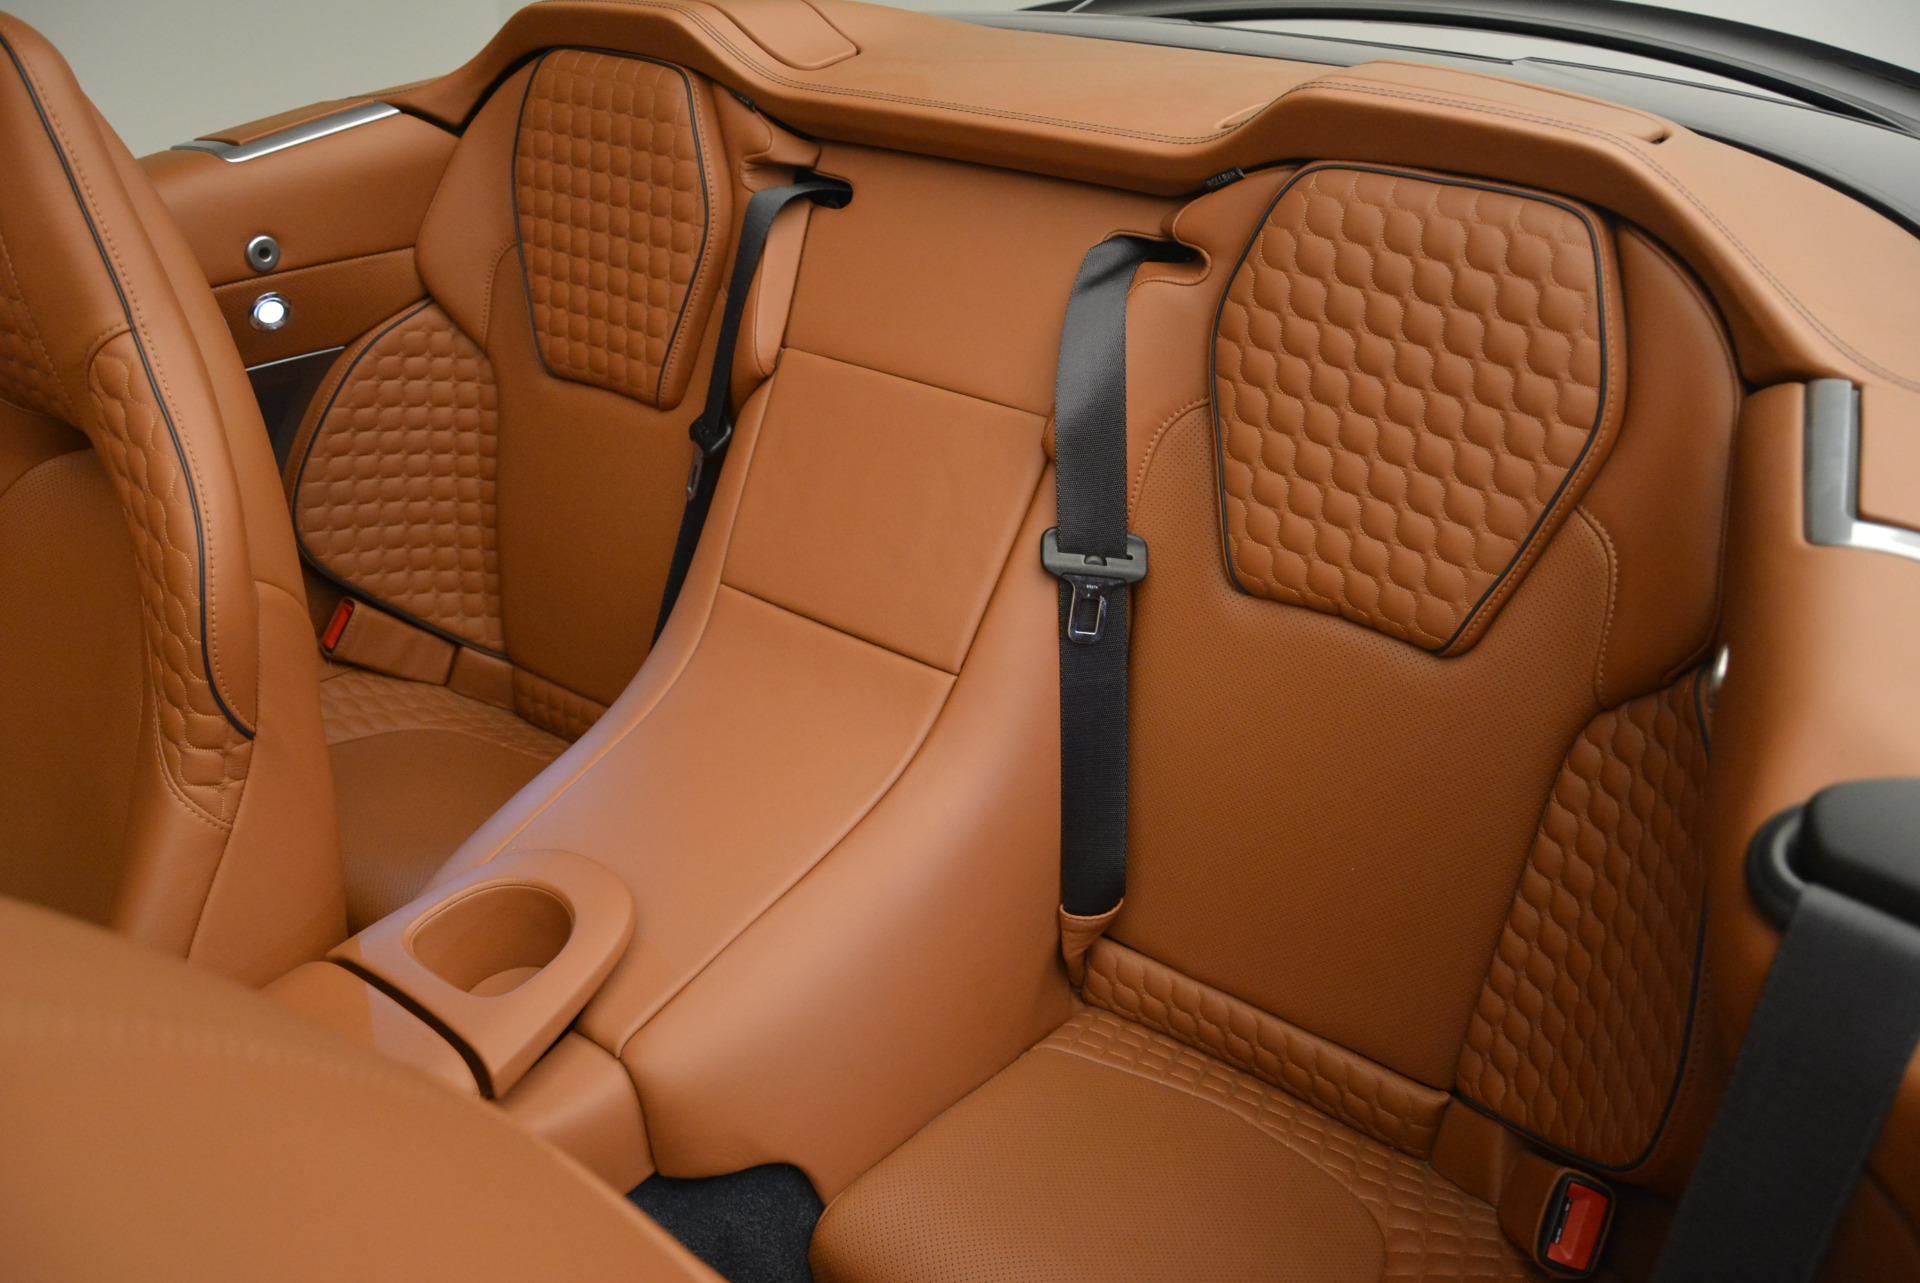 Used 2014 Aston Martin Vanquish Volante For Sale In Greenwich, CT 2097_p24